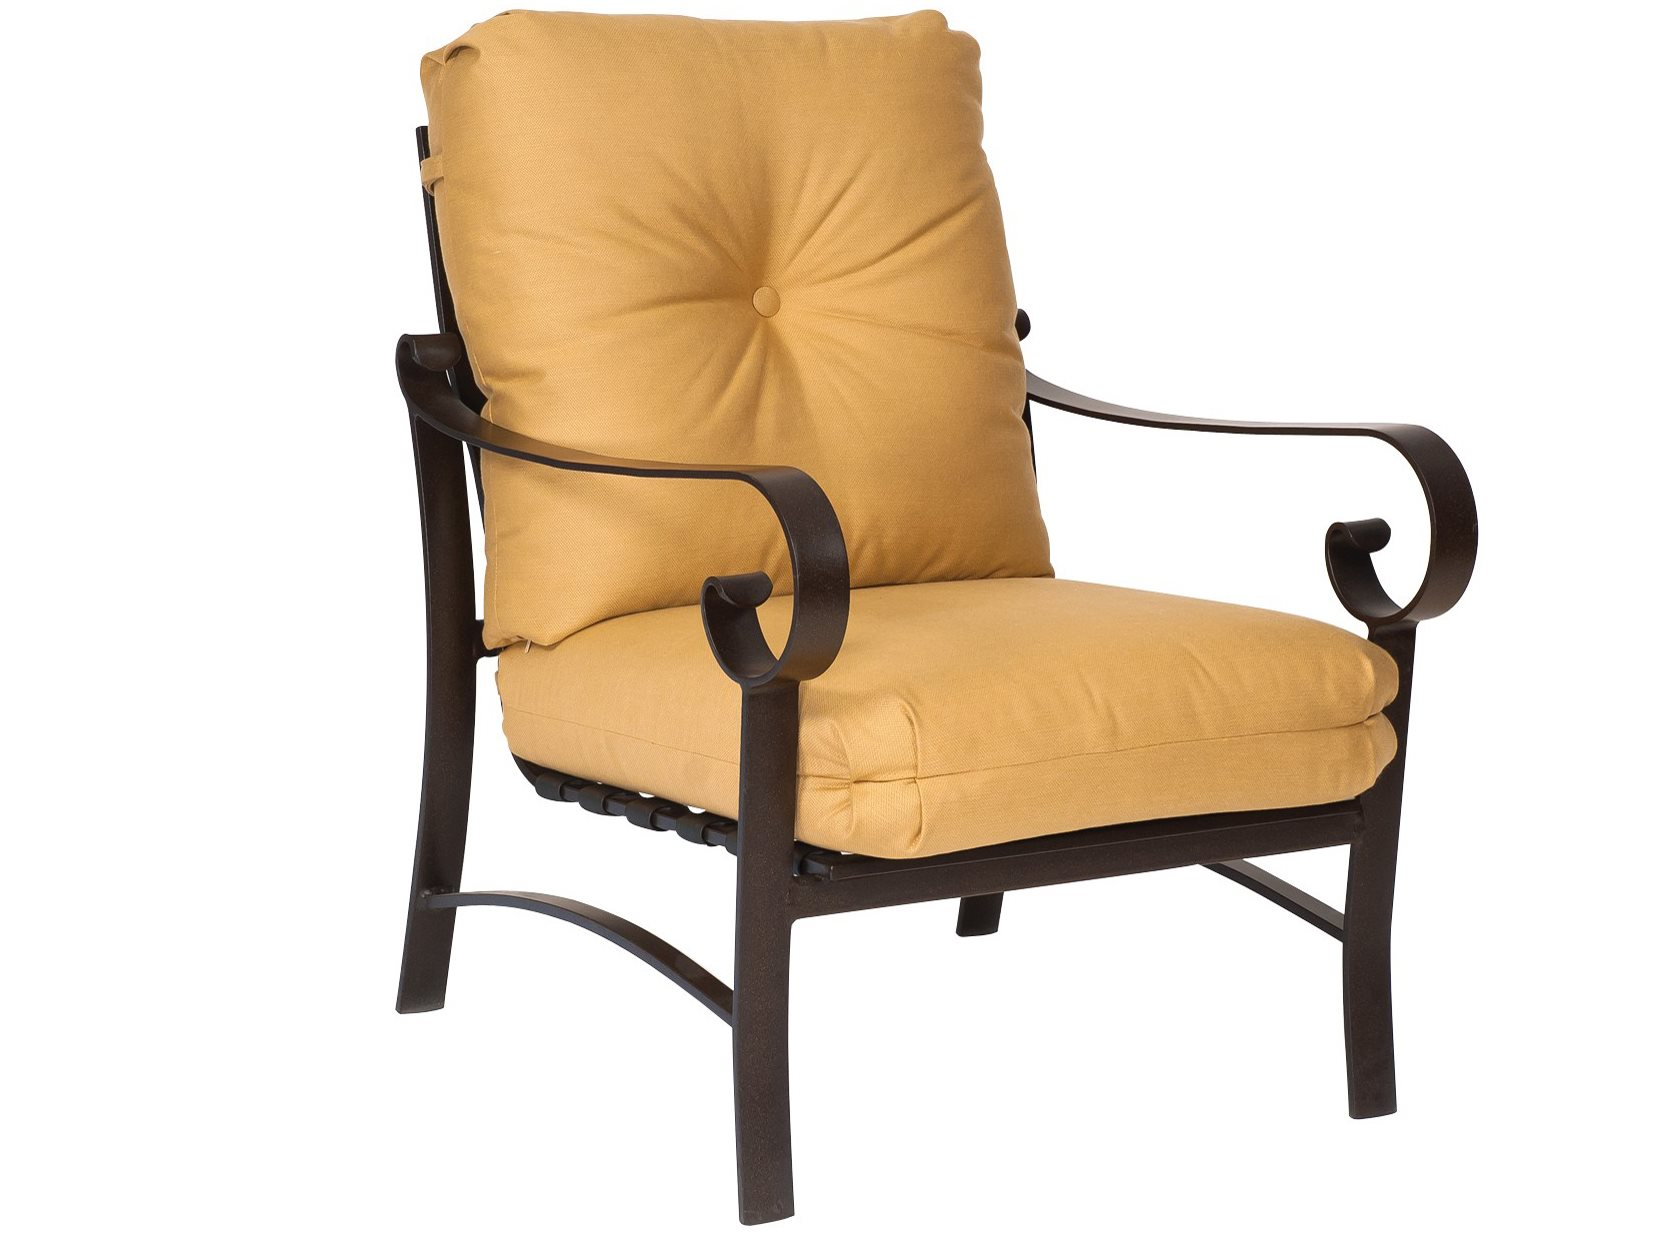 Woodard Belden Dining Chair Replacement Cushions 690401ch